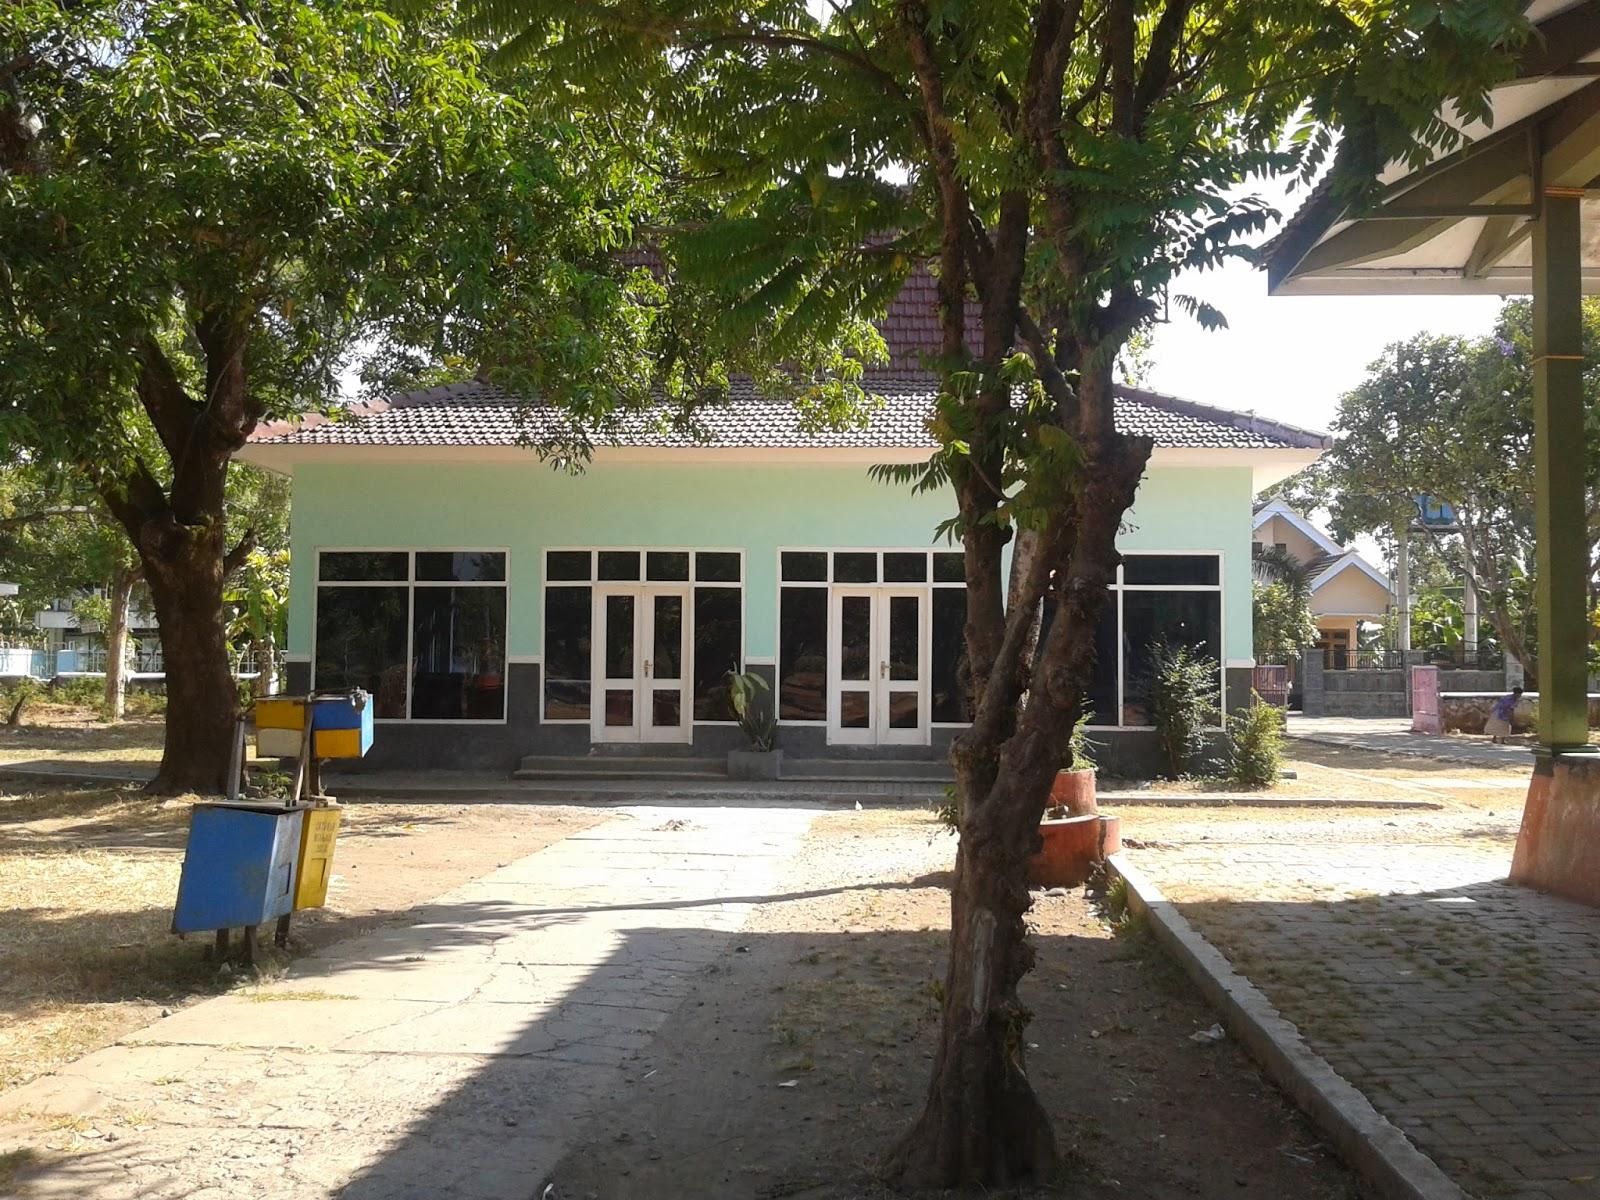 Menelusuri Kabupaten Nganjuk Mutiara Tersembunyi Oktober 2013 Bangunan Pingitan Barat